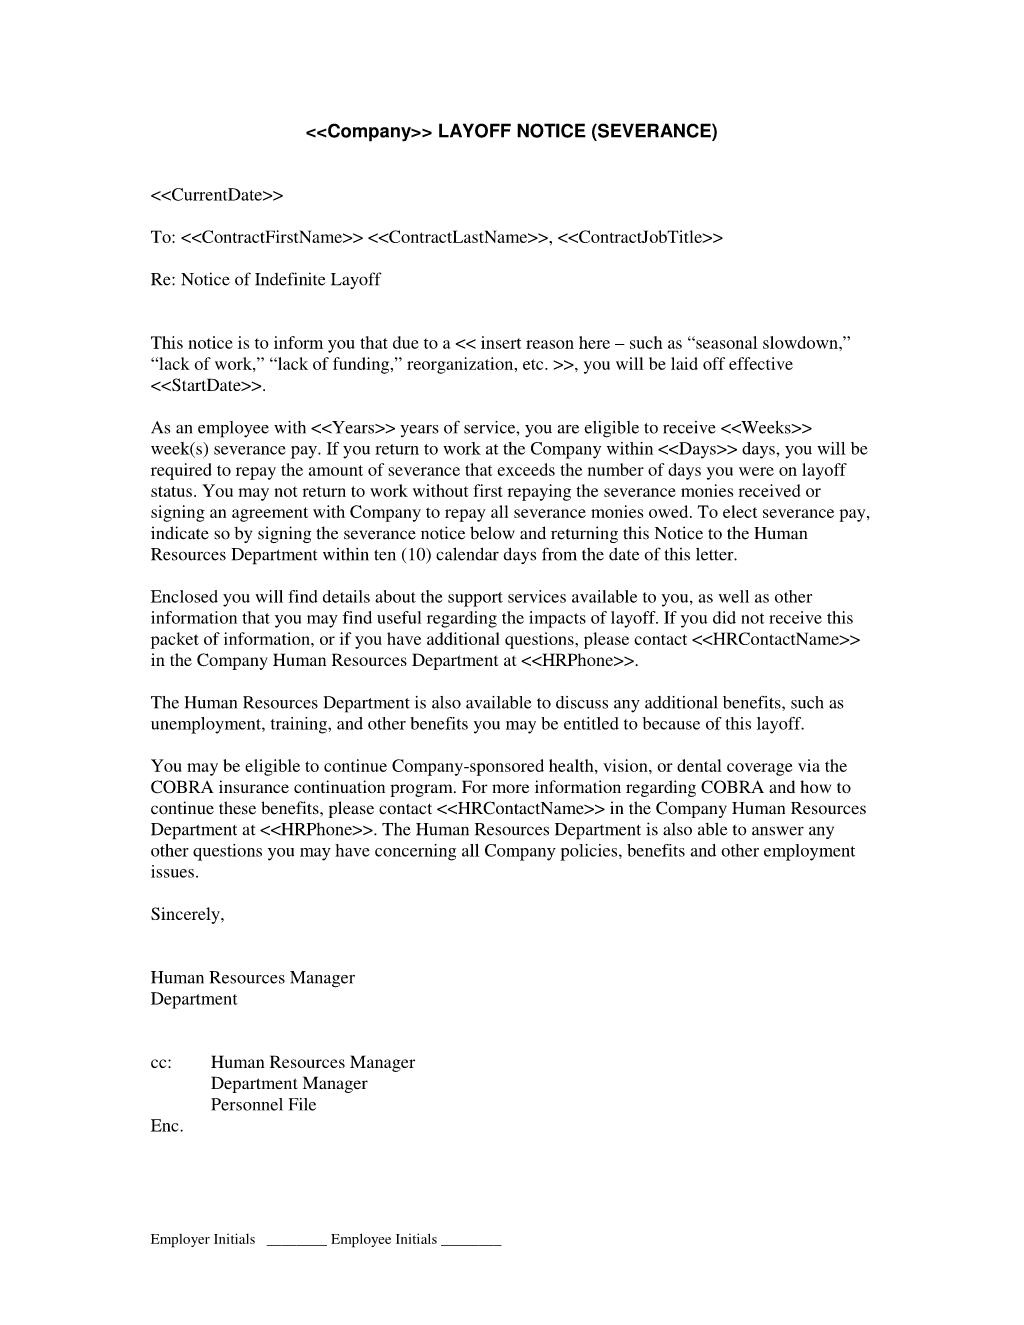 severance letter templates